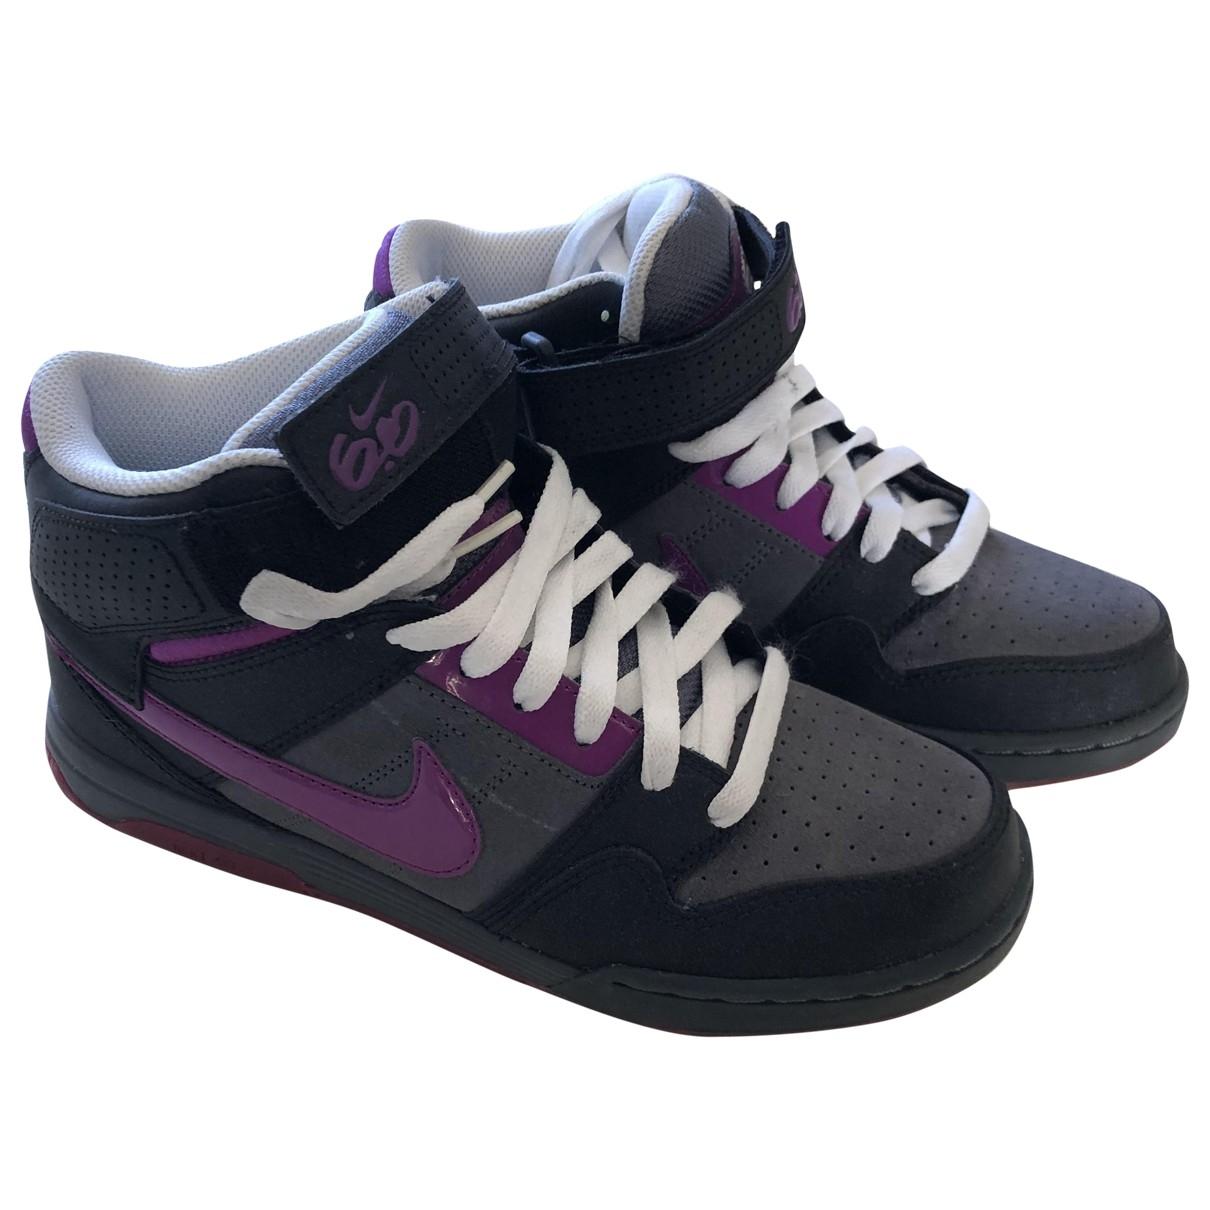 Nike SB Dunk  Sneakers in  Anthrazit Leder